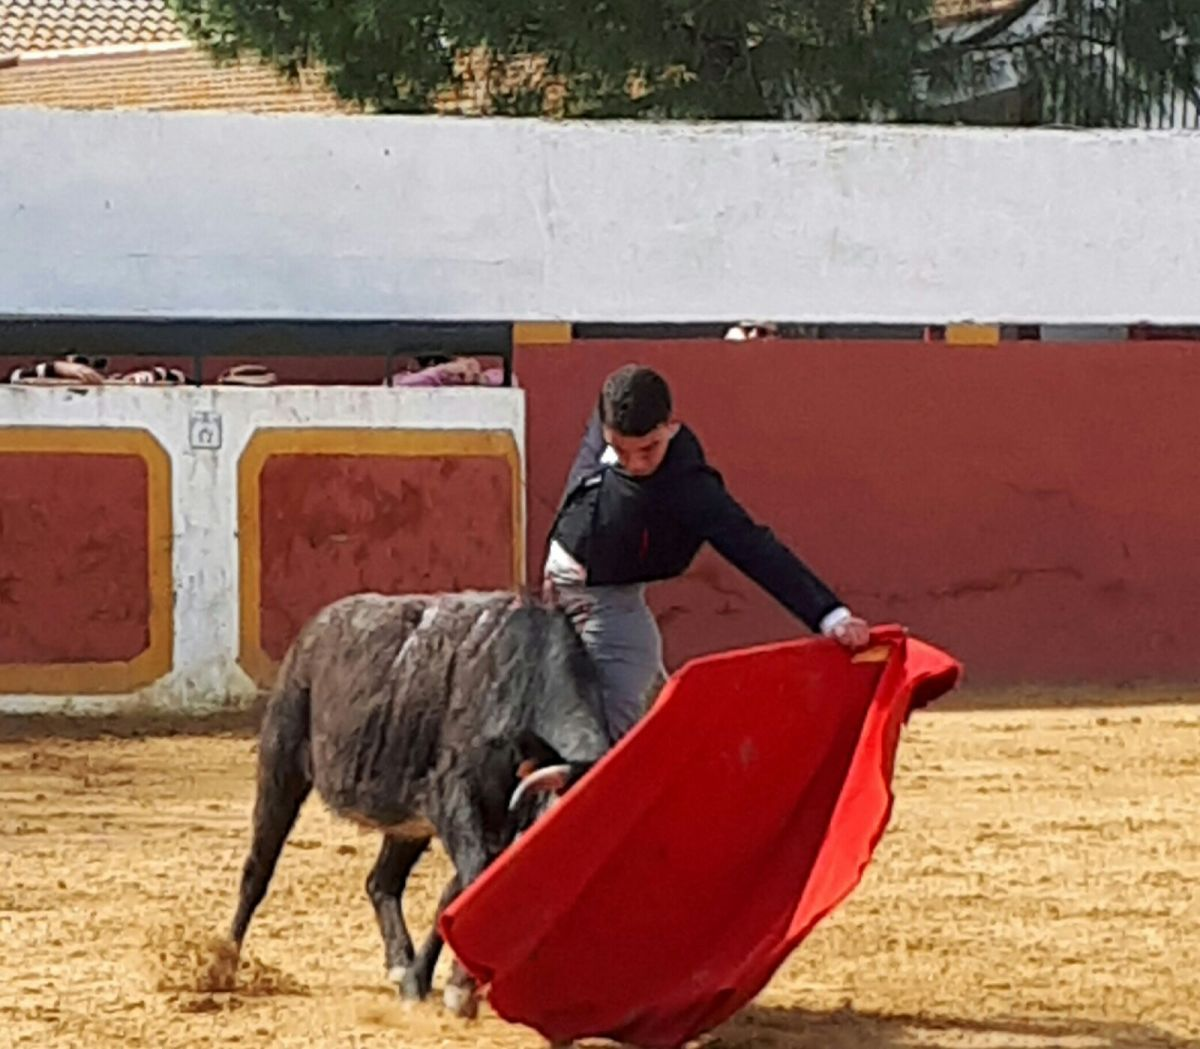 El Club Taurino de Sant Boi celebra la seva tradicional festa campera